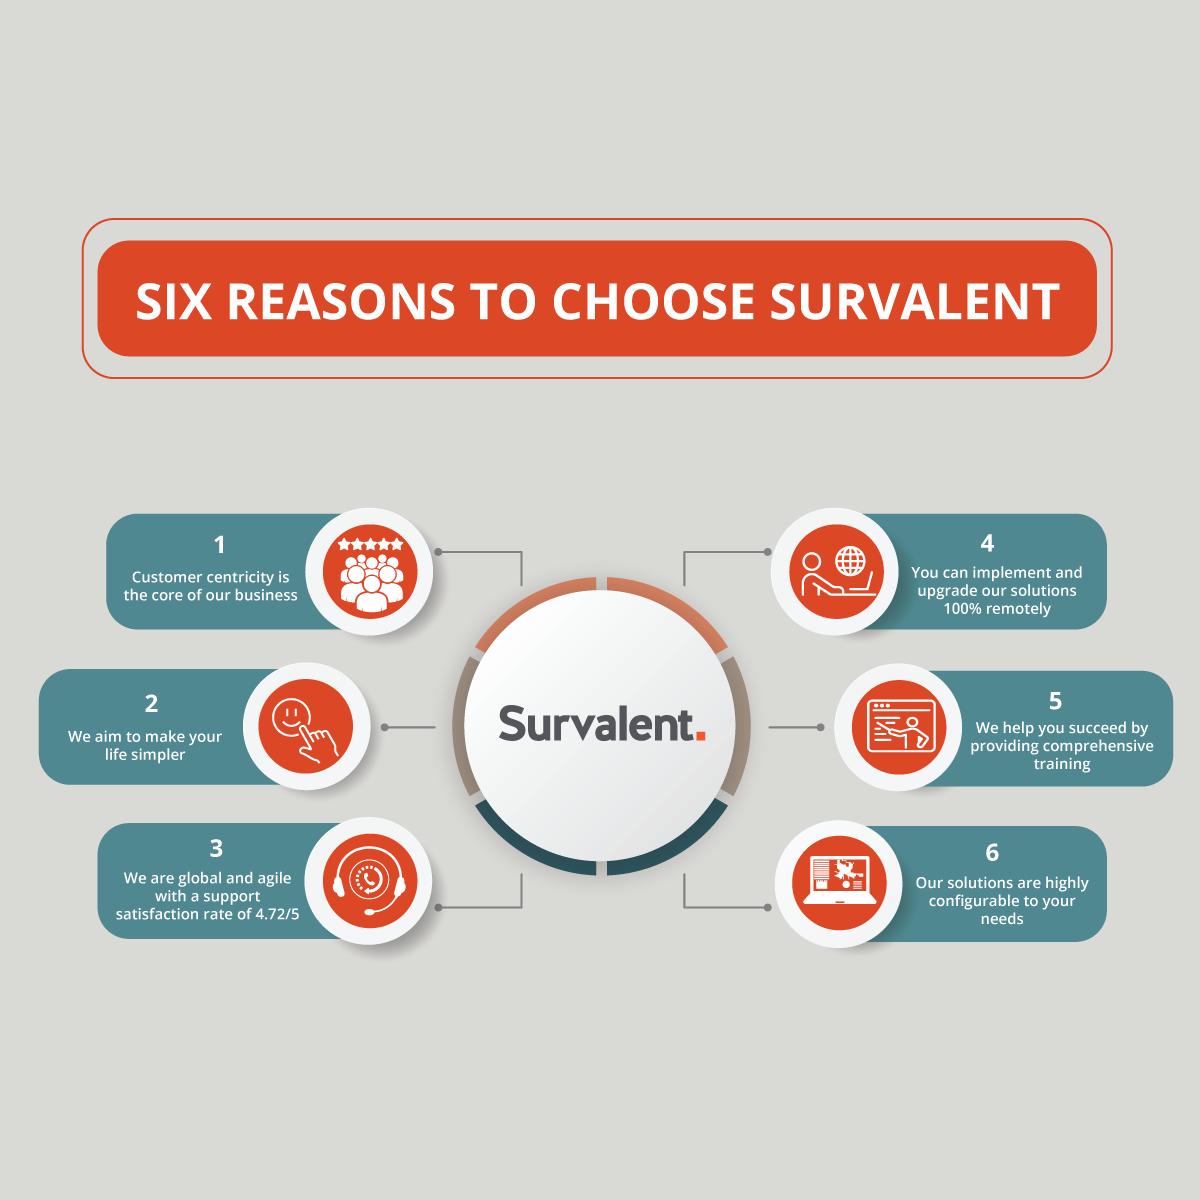 Survalent Infographic Image Box